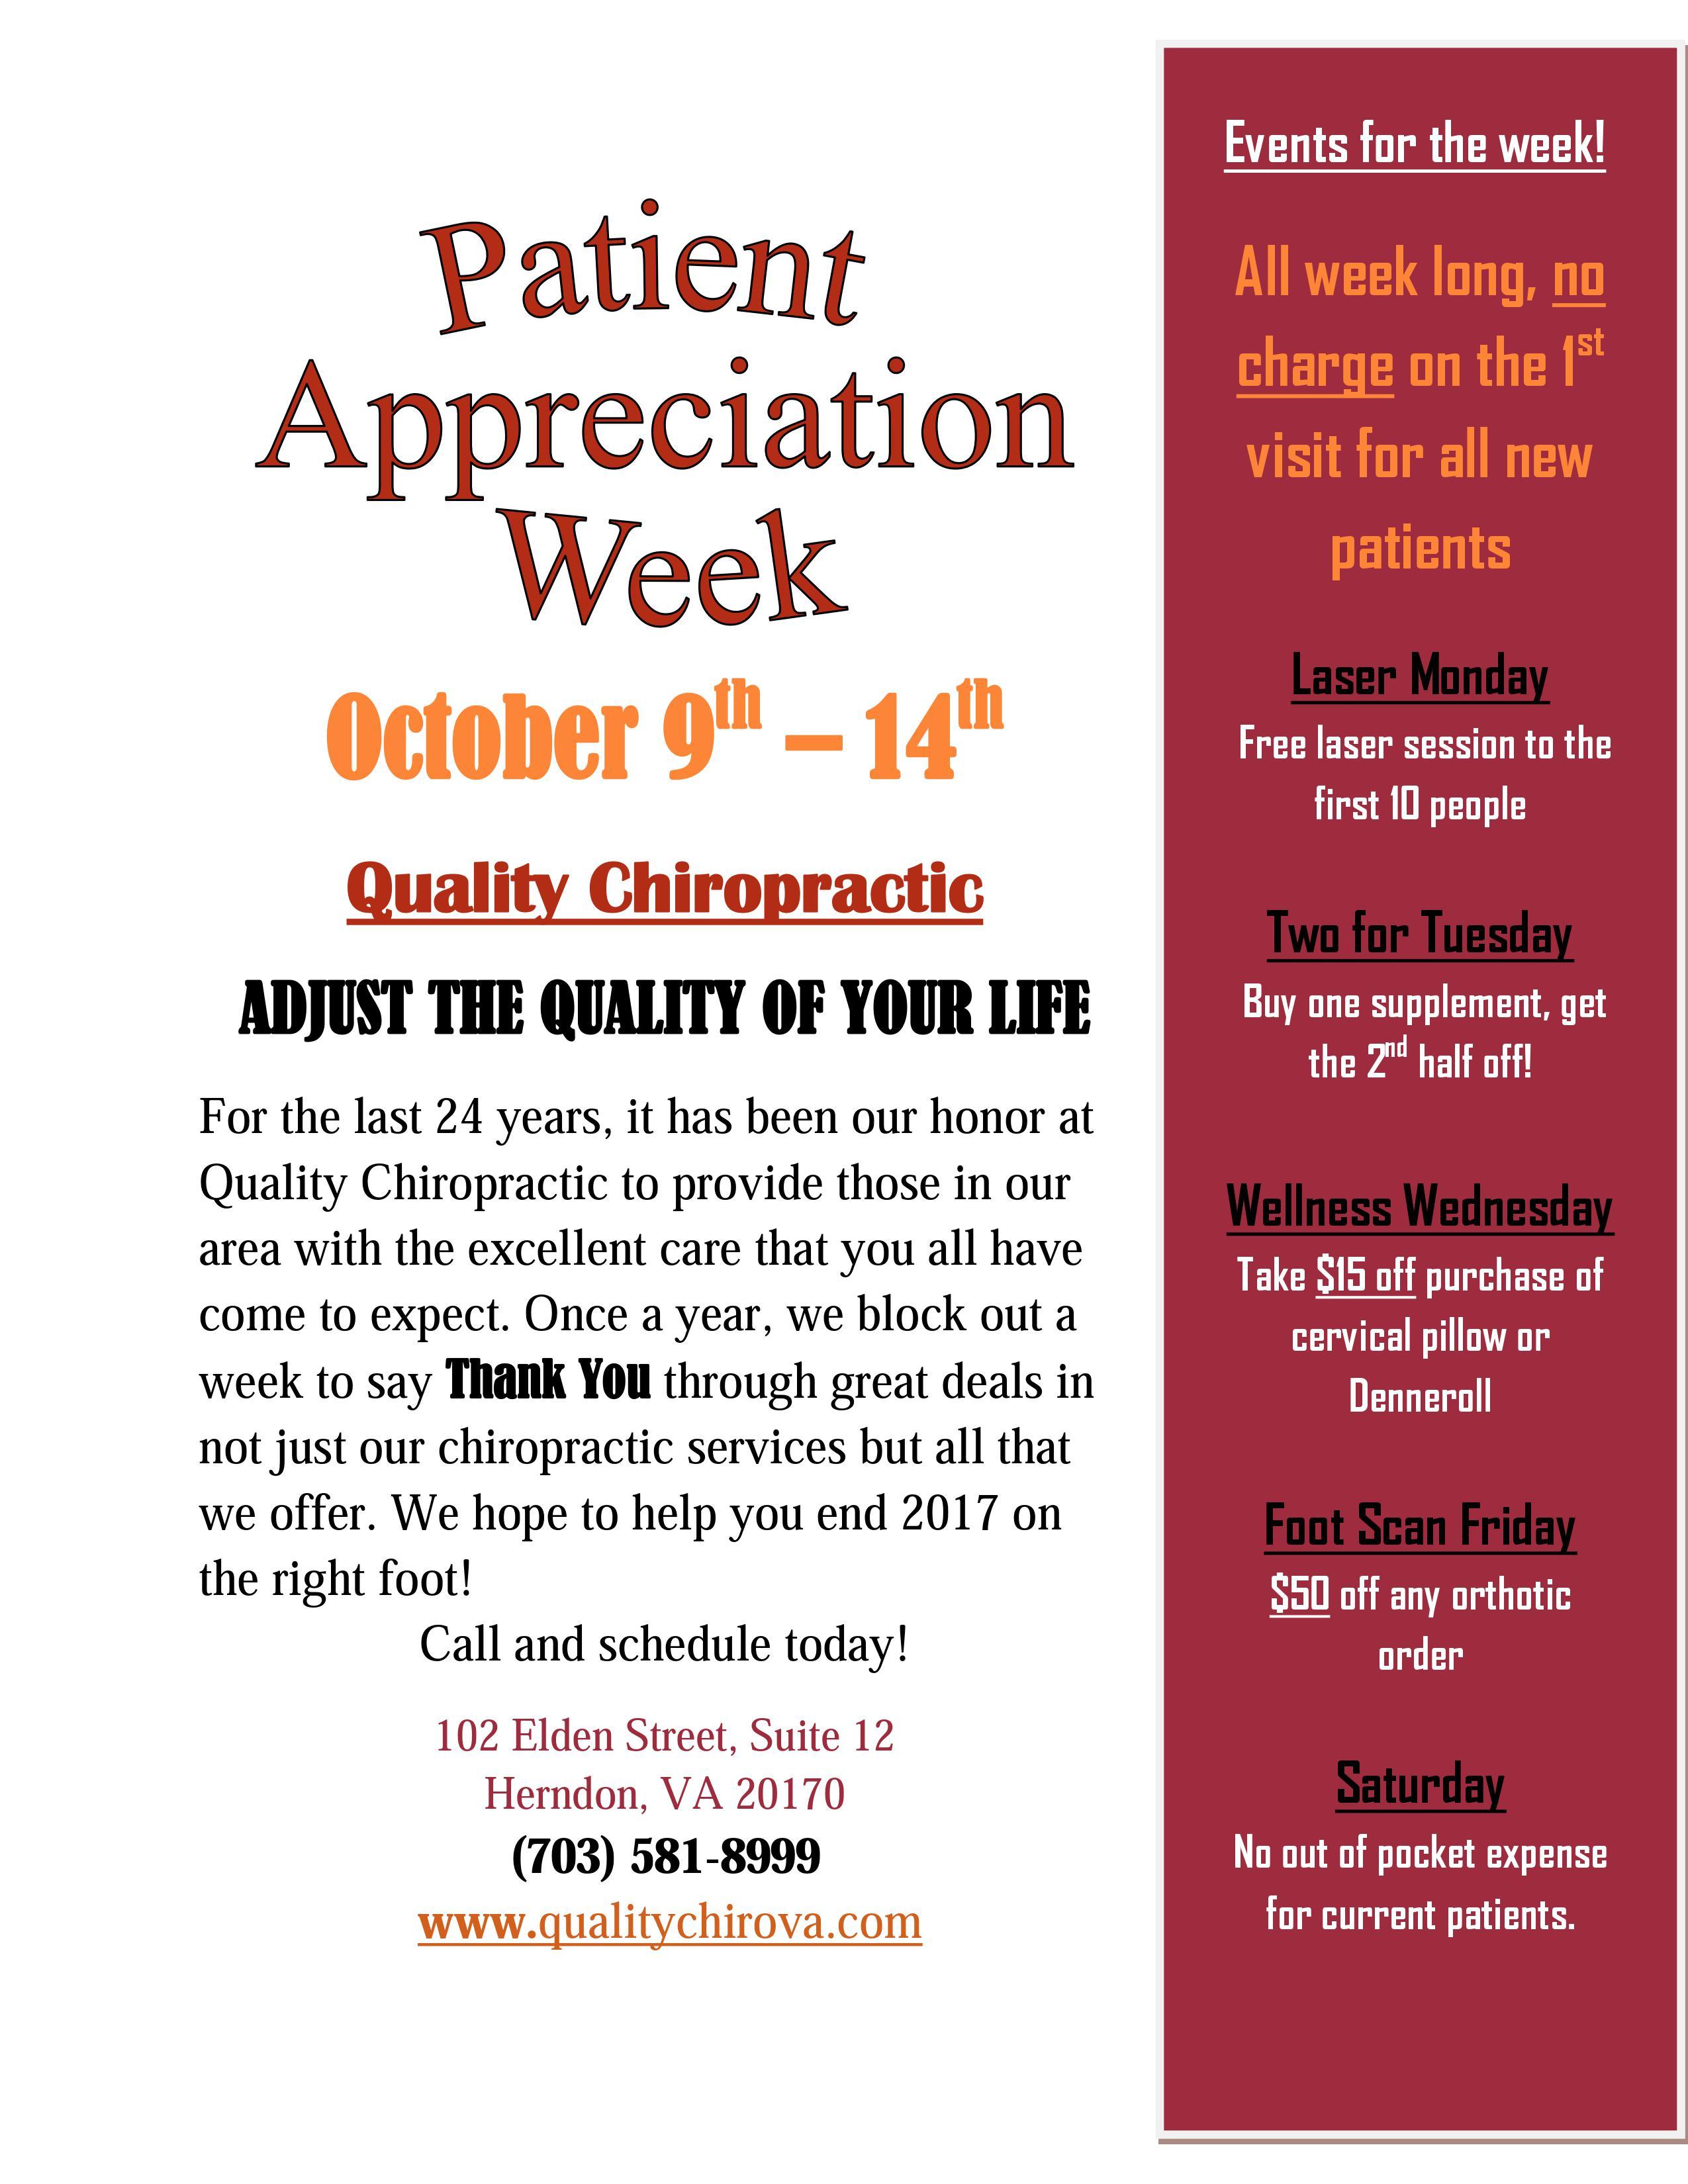 Quality Chiropractic: Chiropractors: Falls Church, VA & Herndon, VA